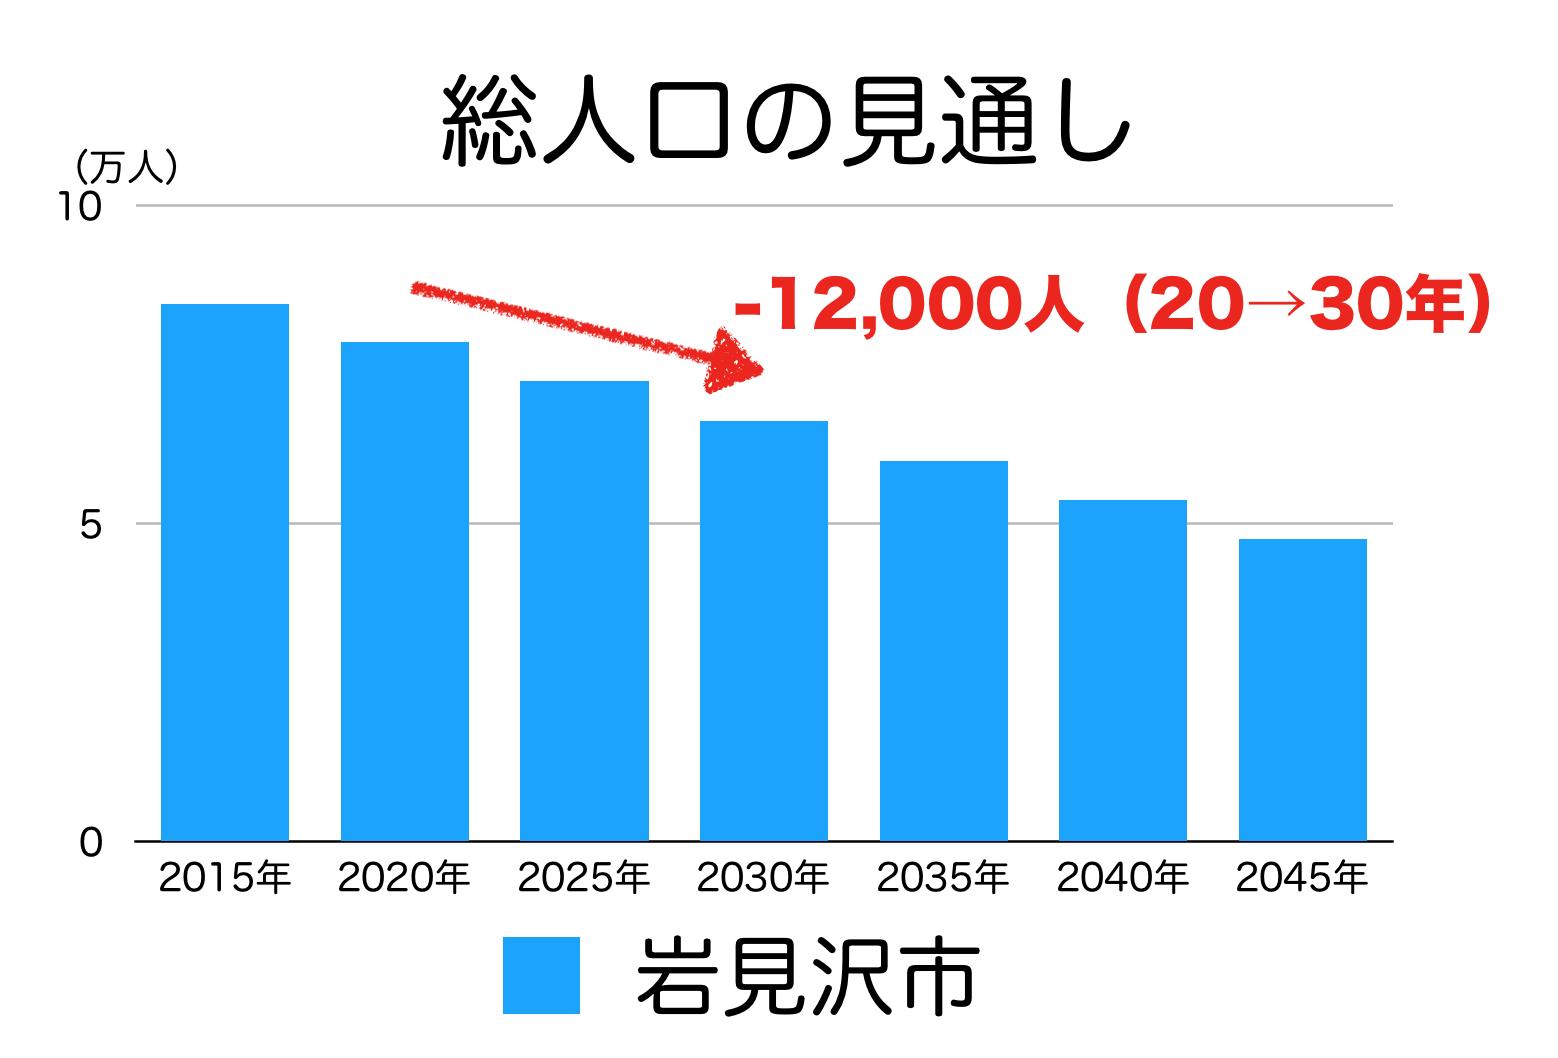 岩見沢市の人口予測